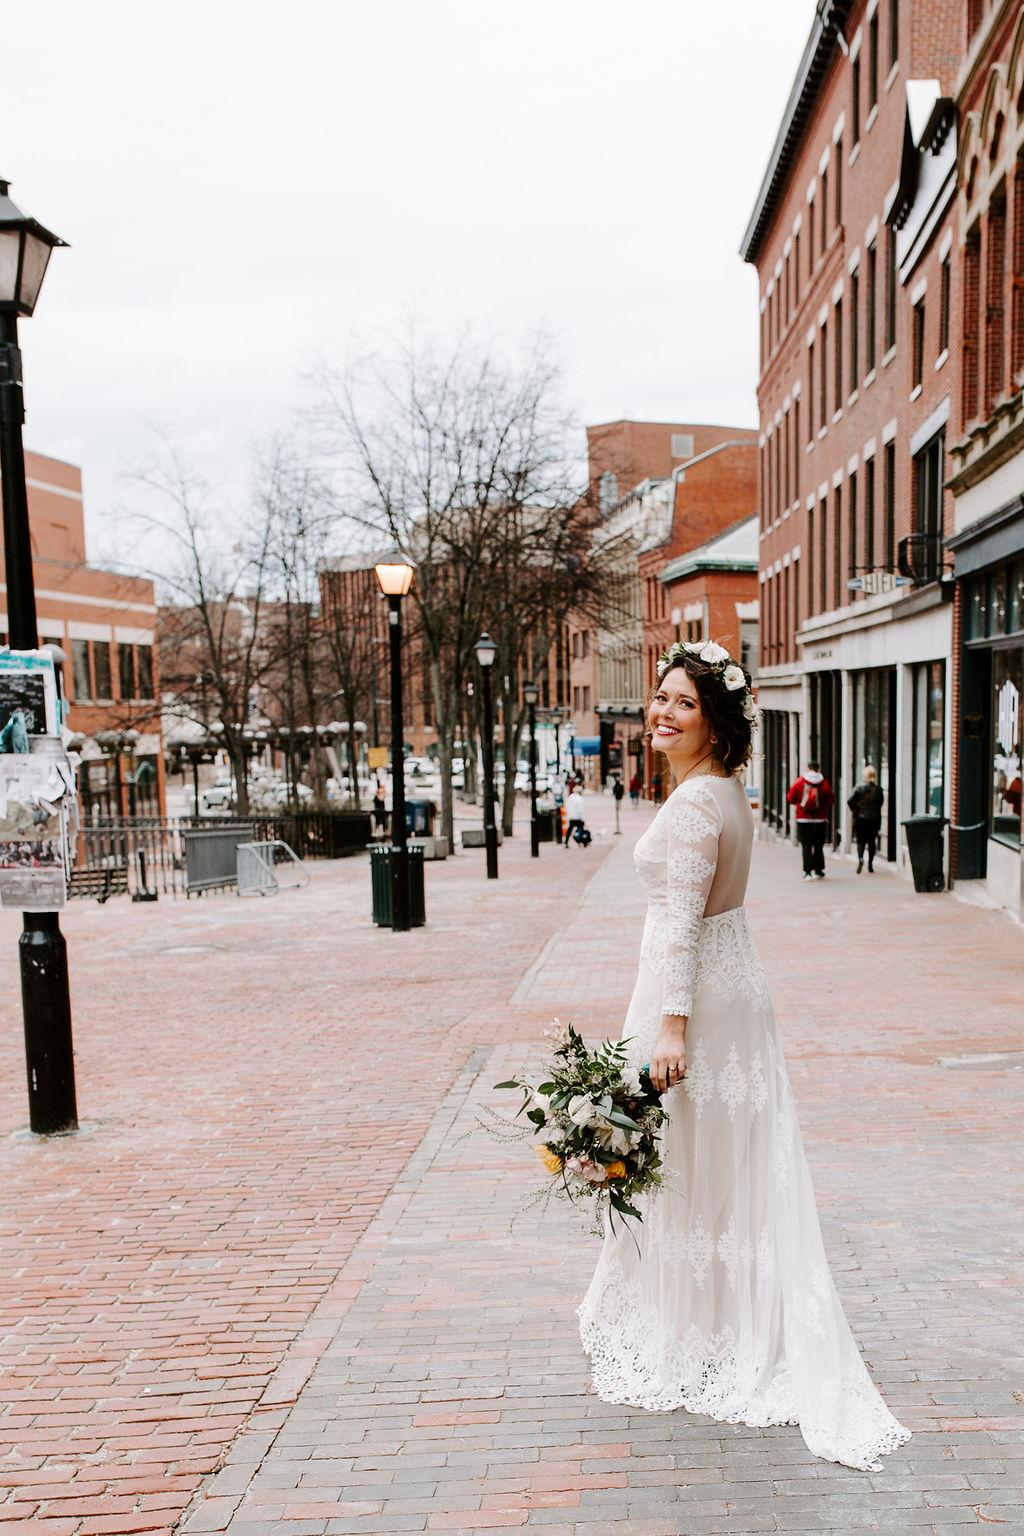 OMaine Studios Portland Maine Wedding_042719_18.jpg